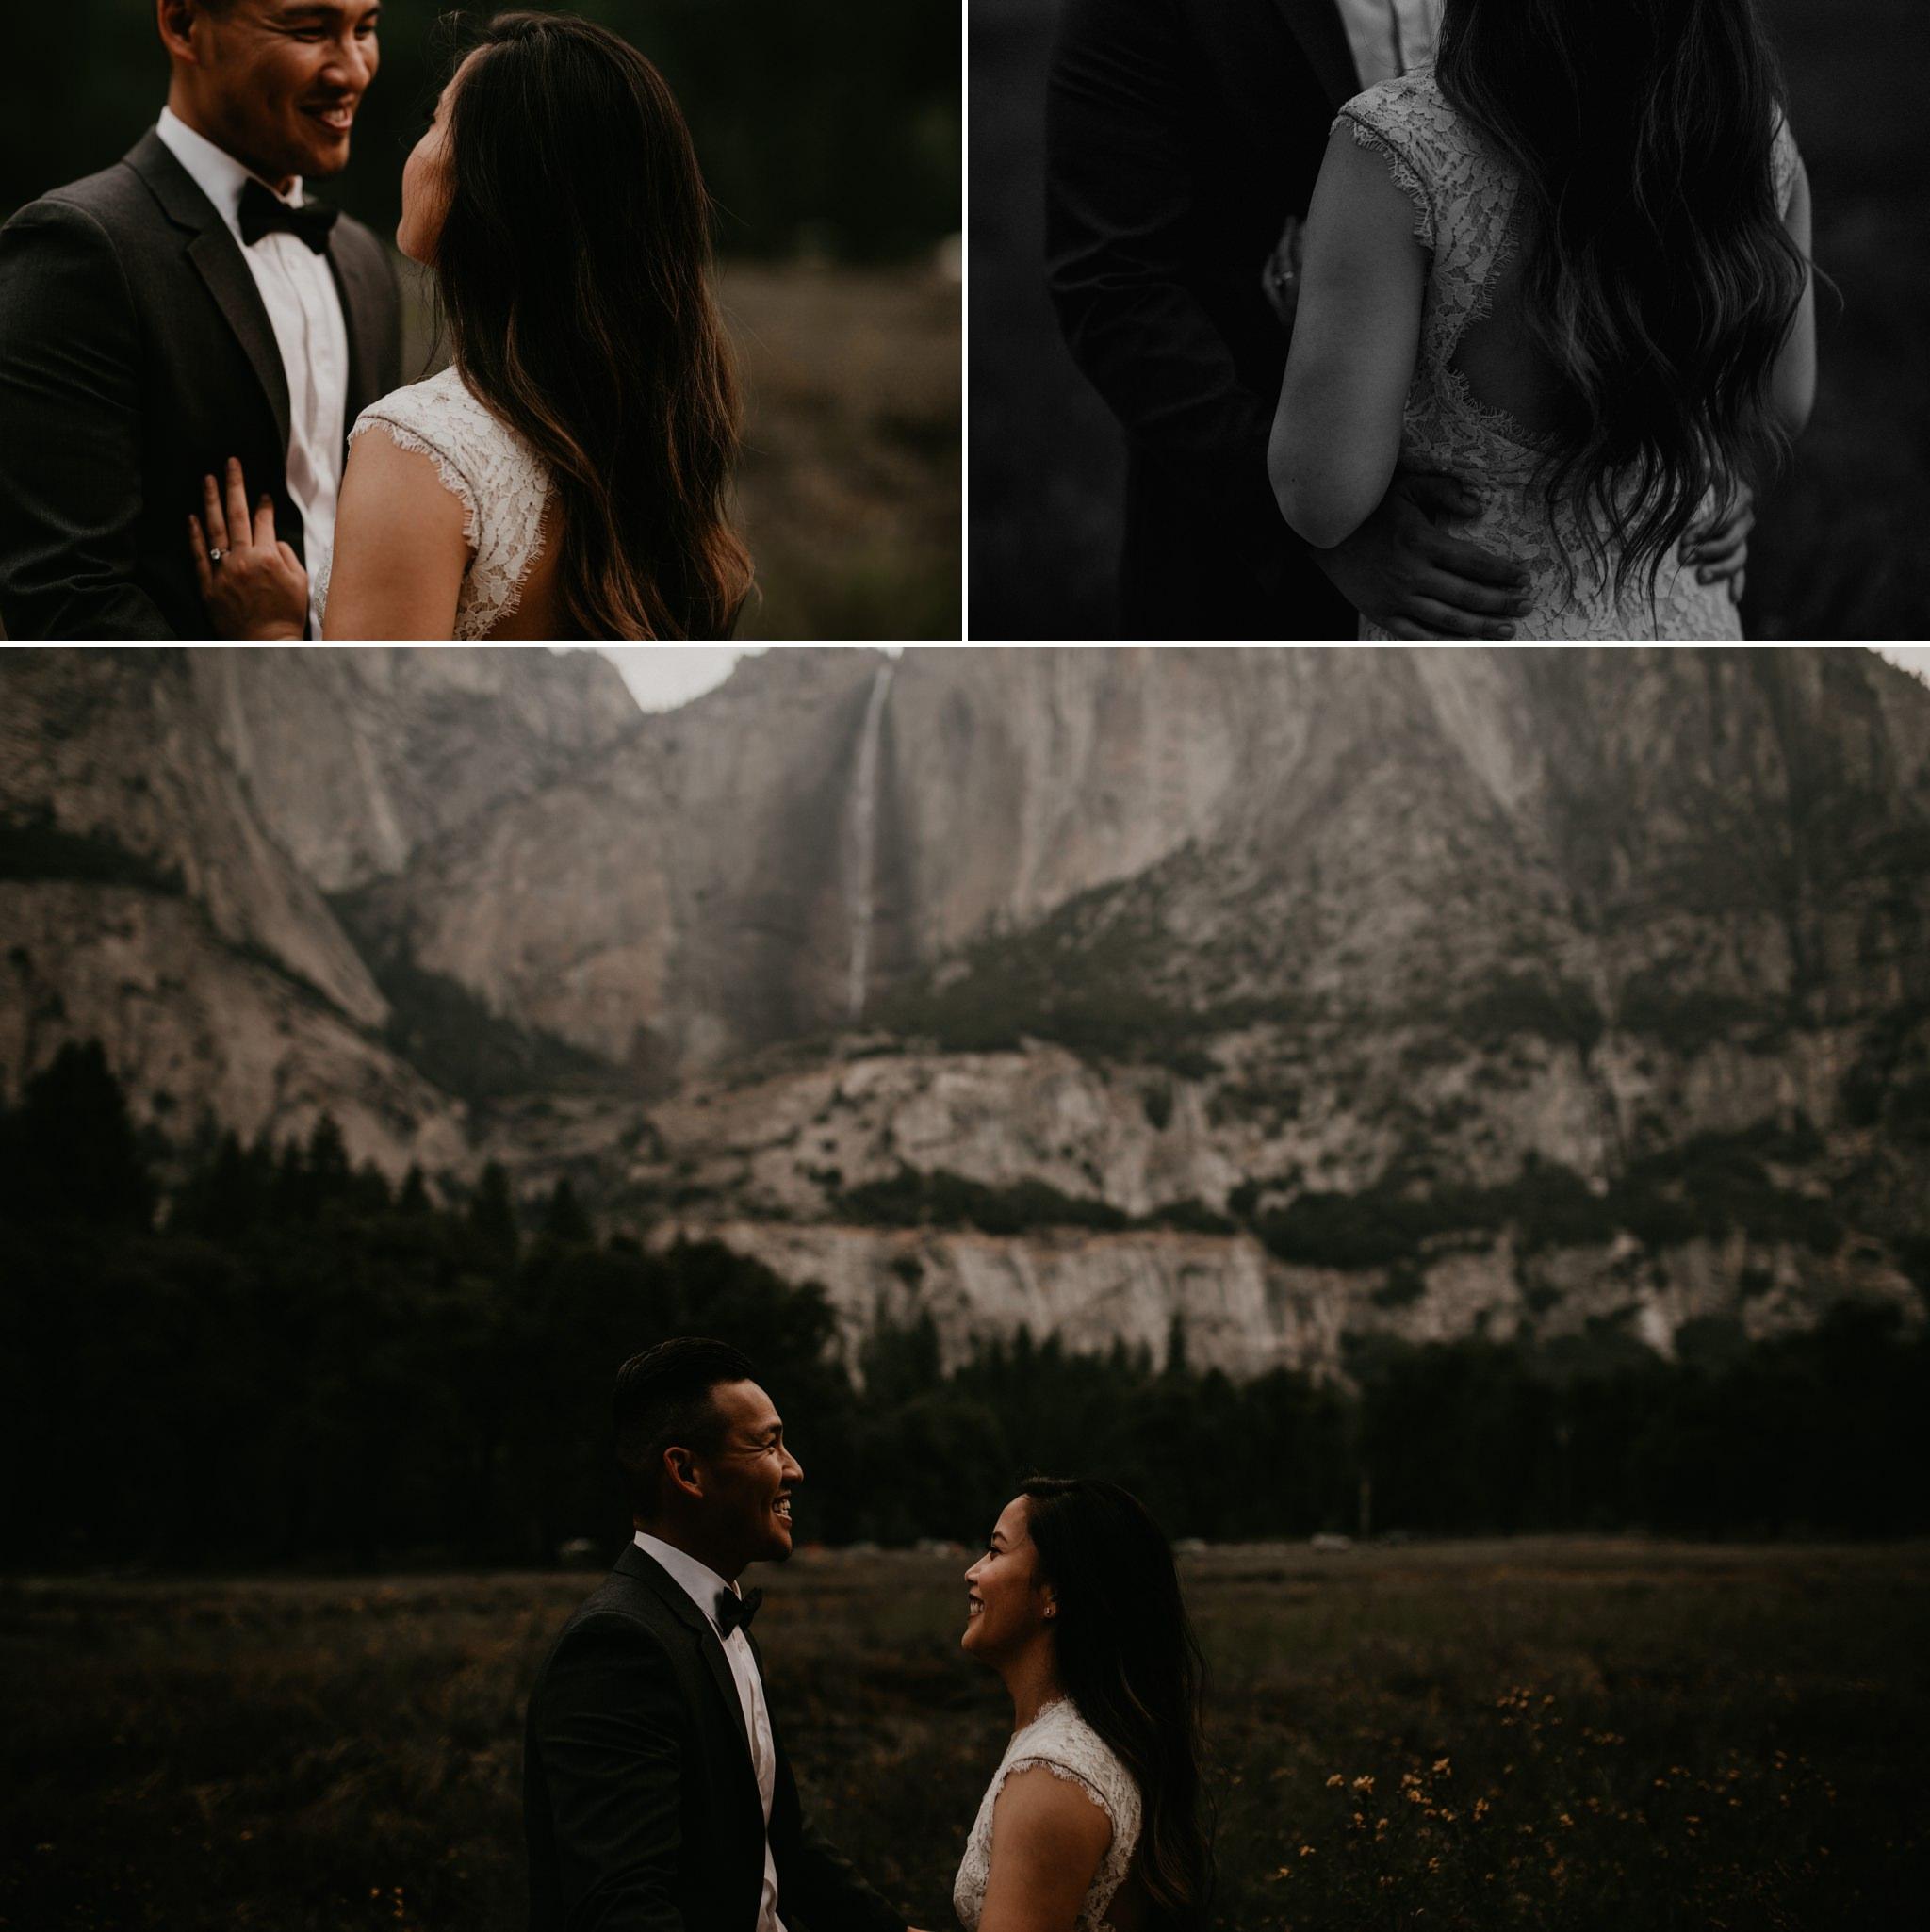 Yosemite-Valley-Wedding8.jpg